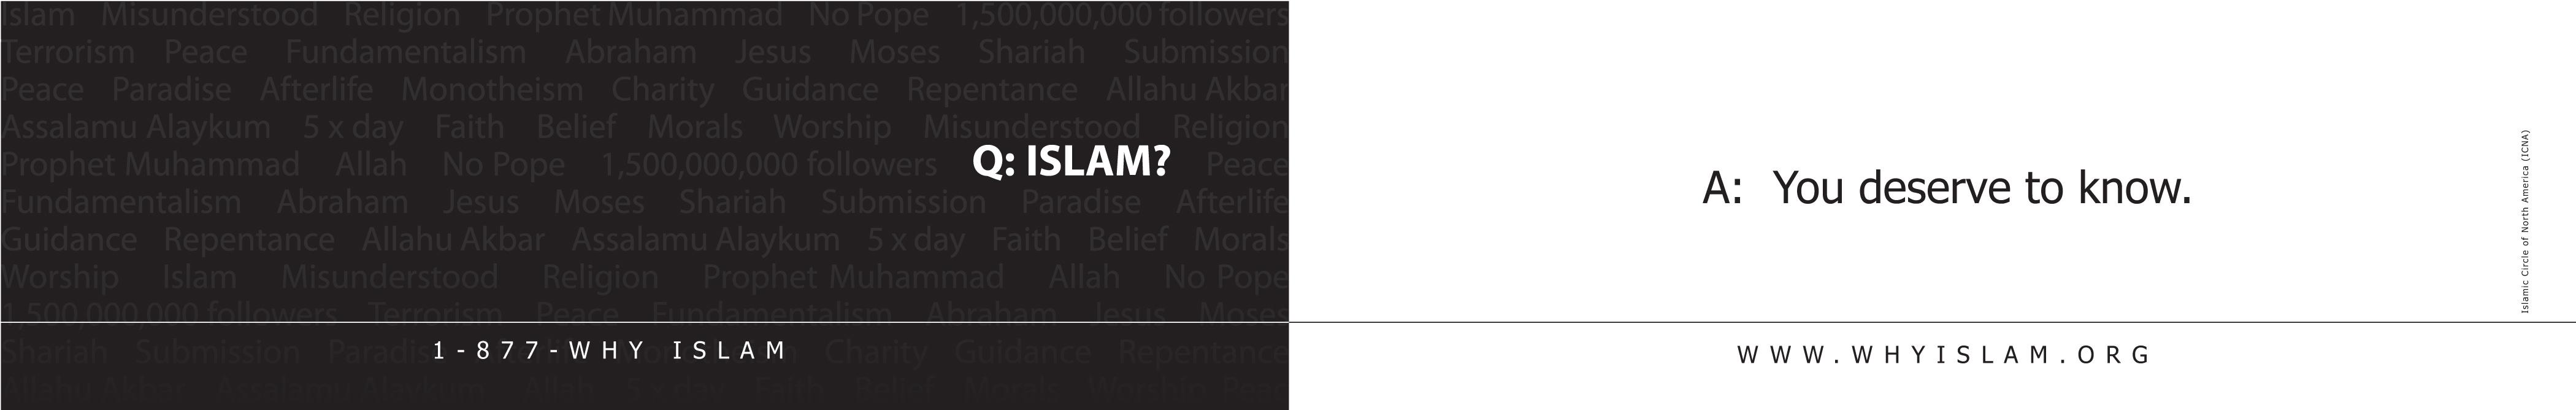 ad_islam.jpg